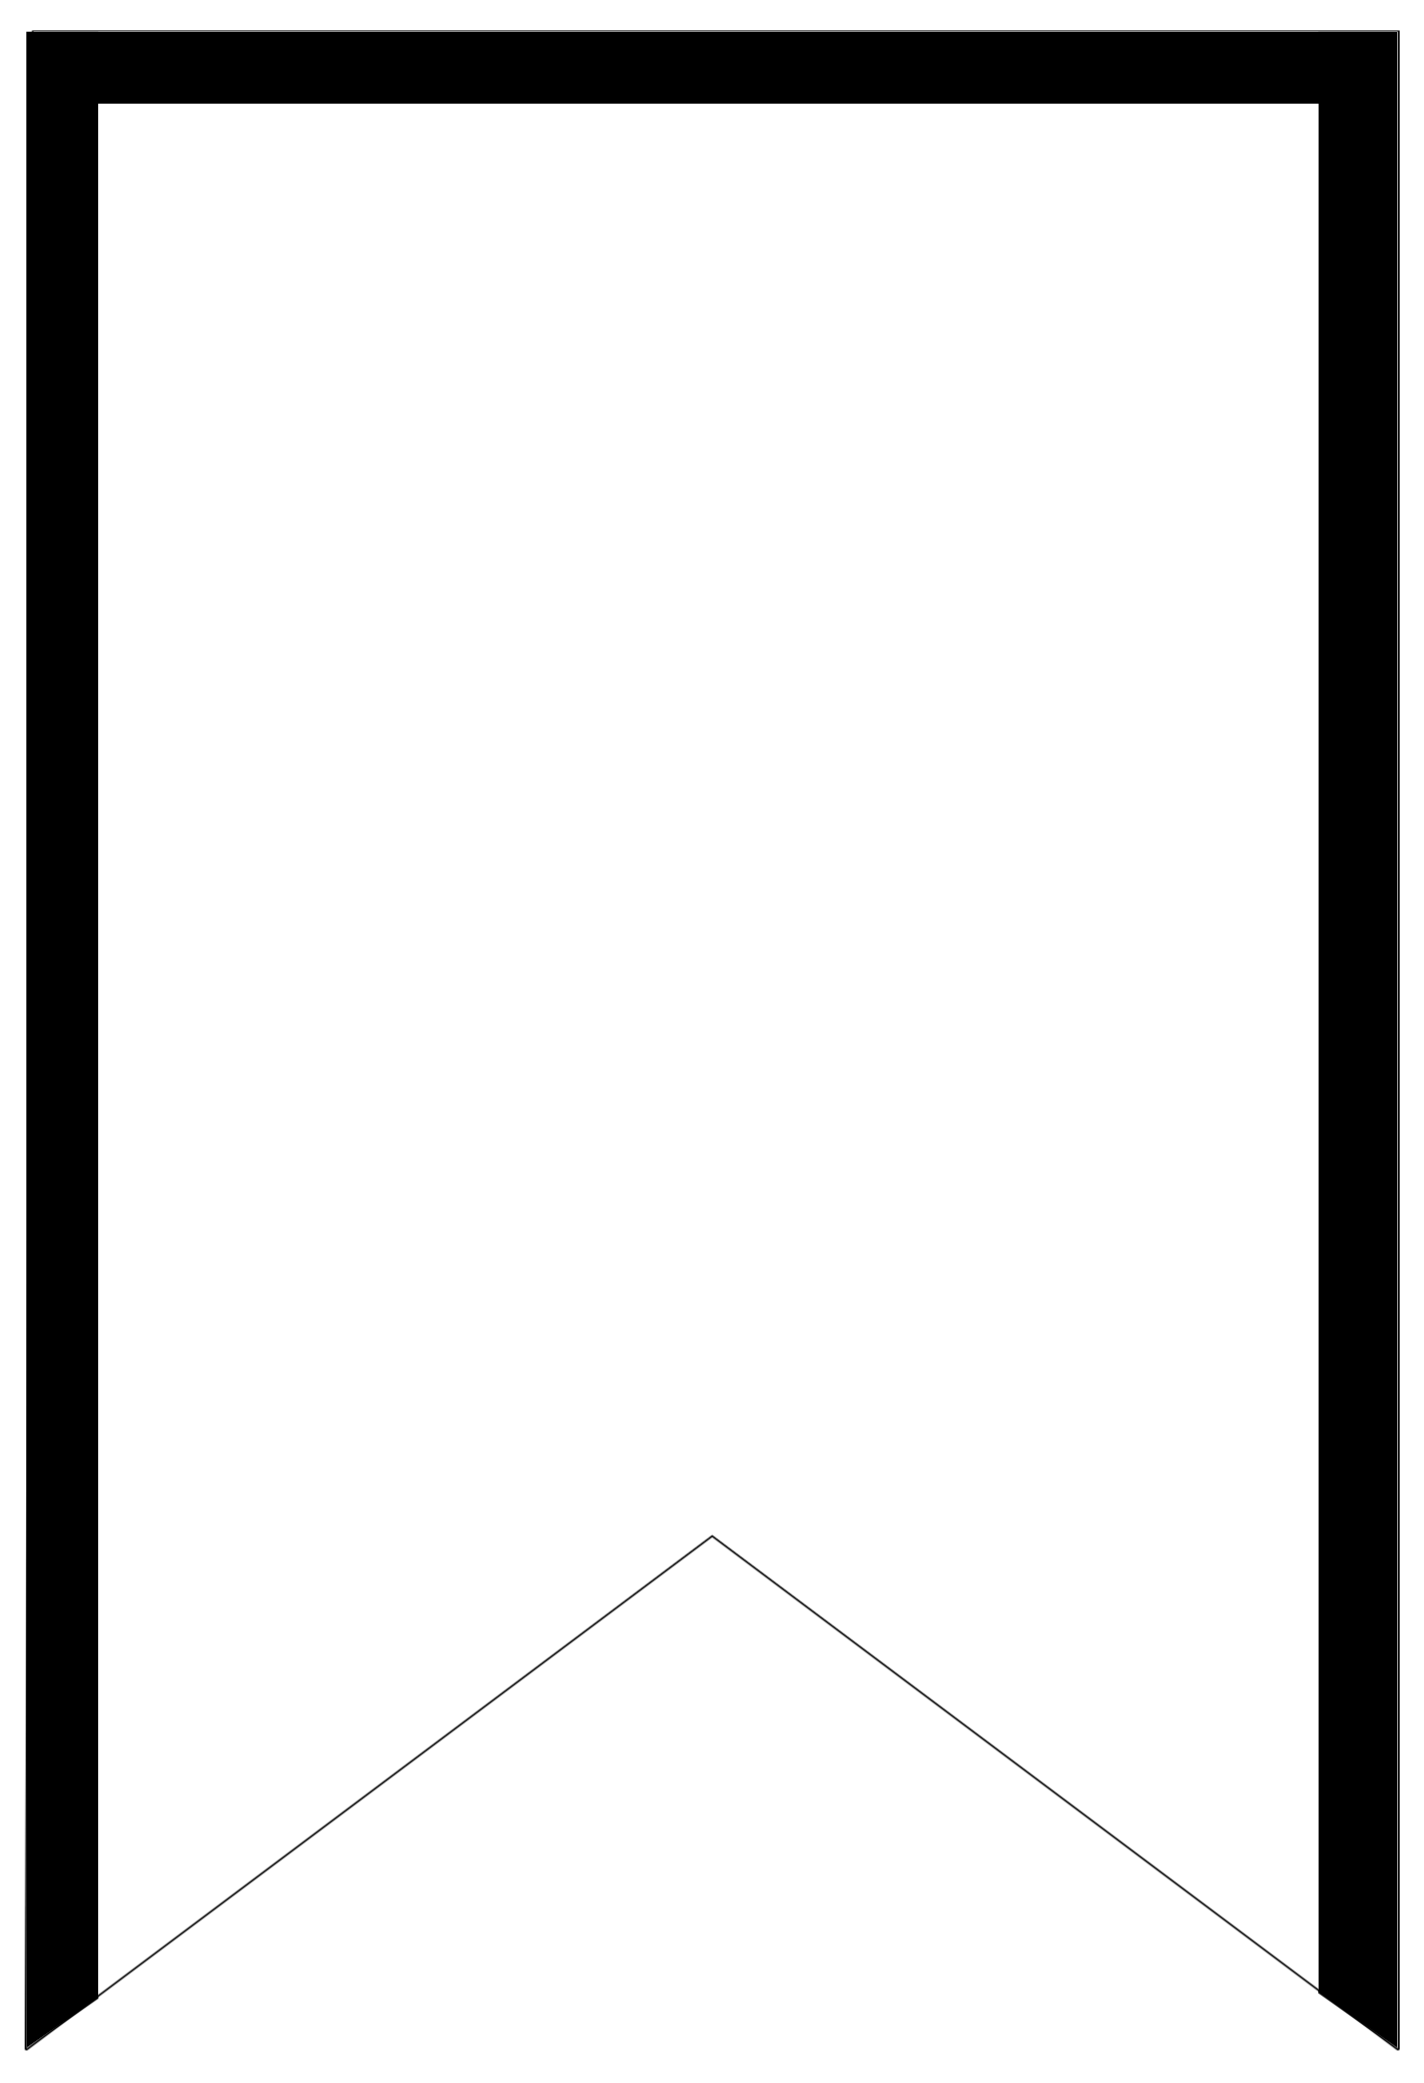 pin by stephanie valleroy on cricut tips